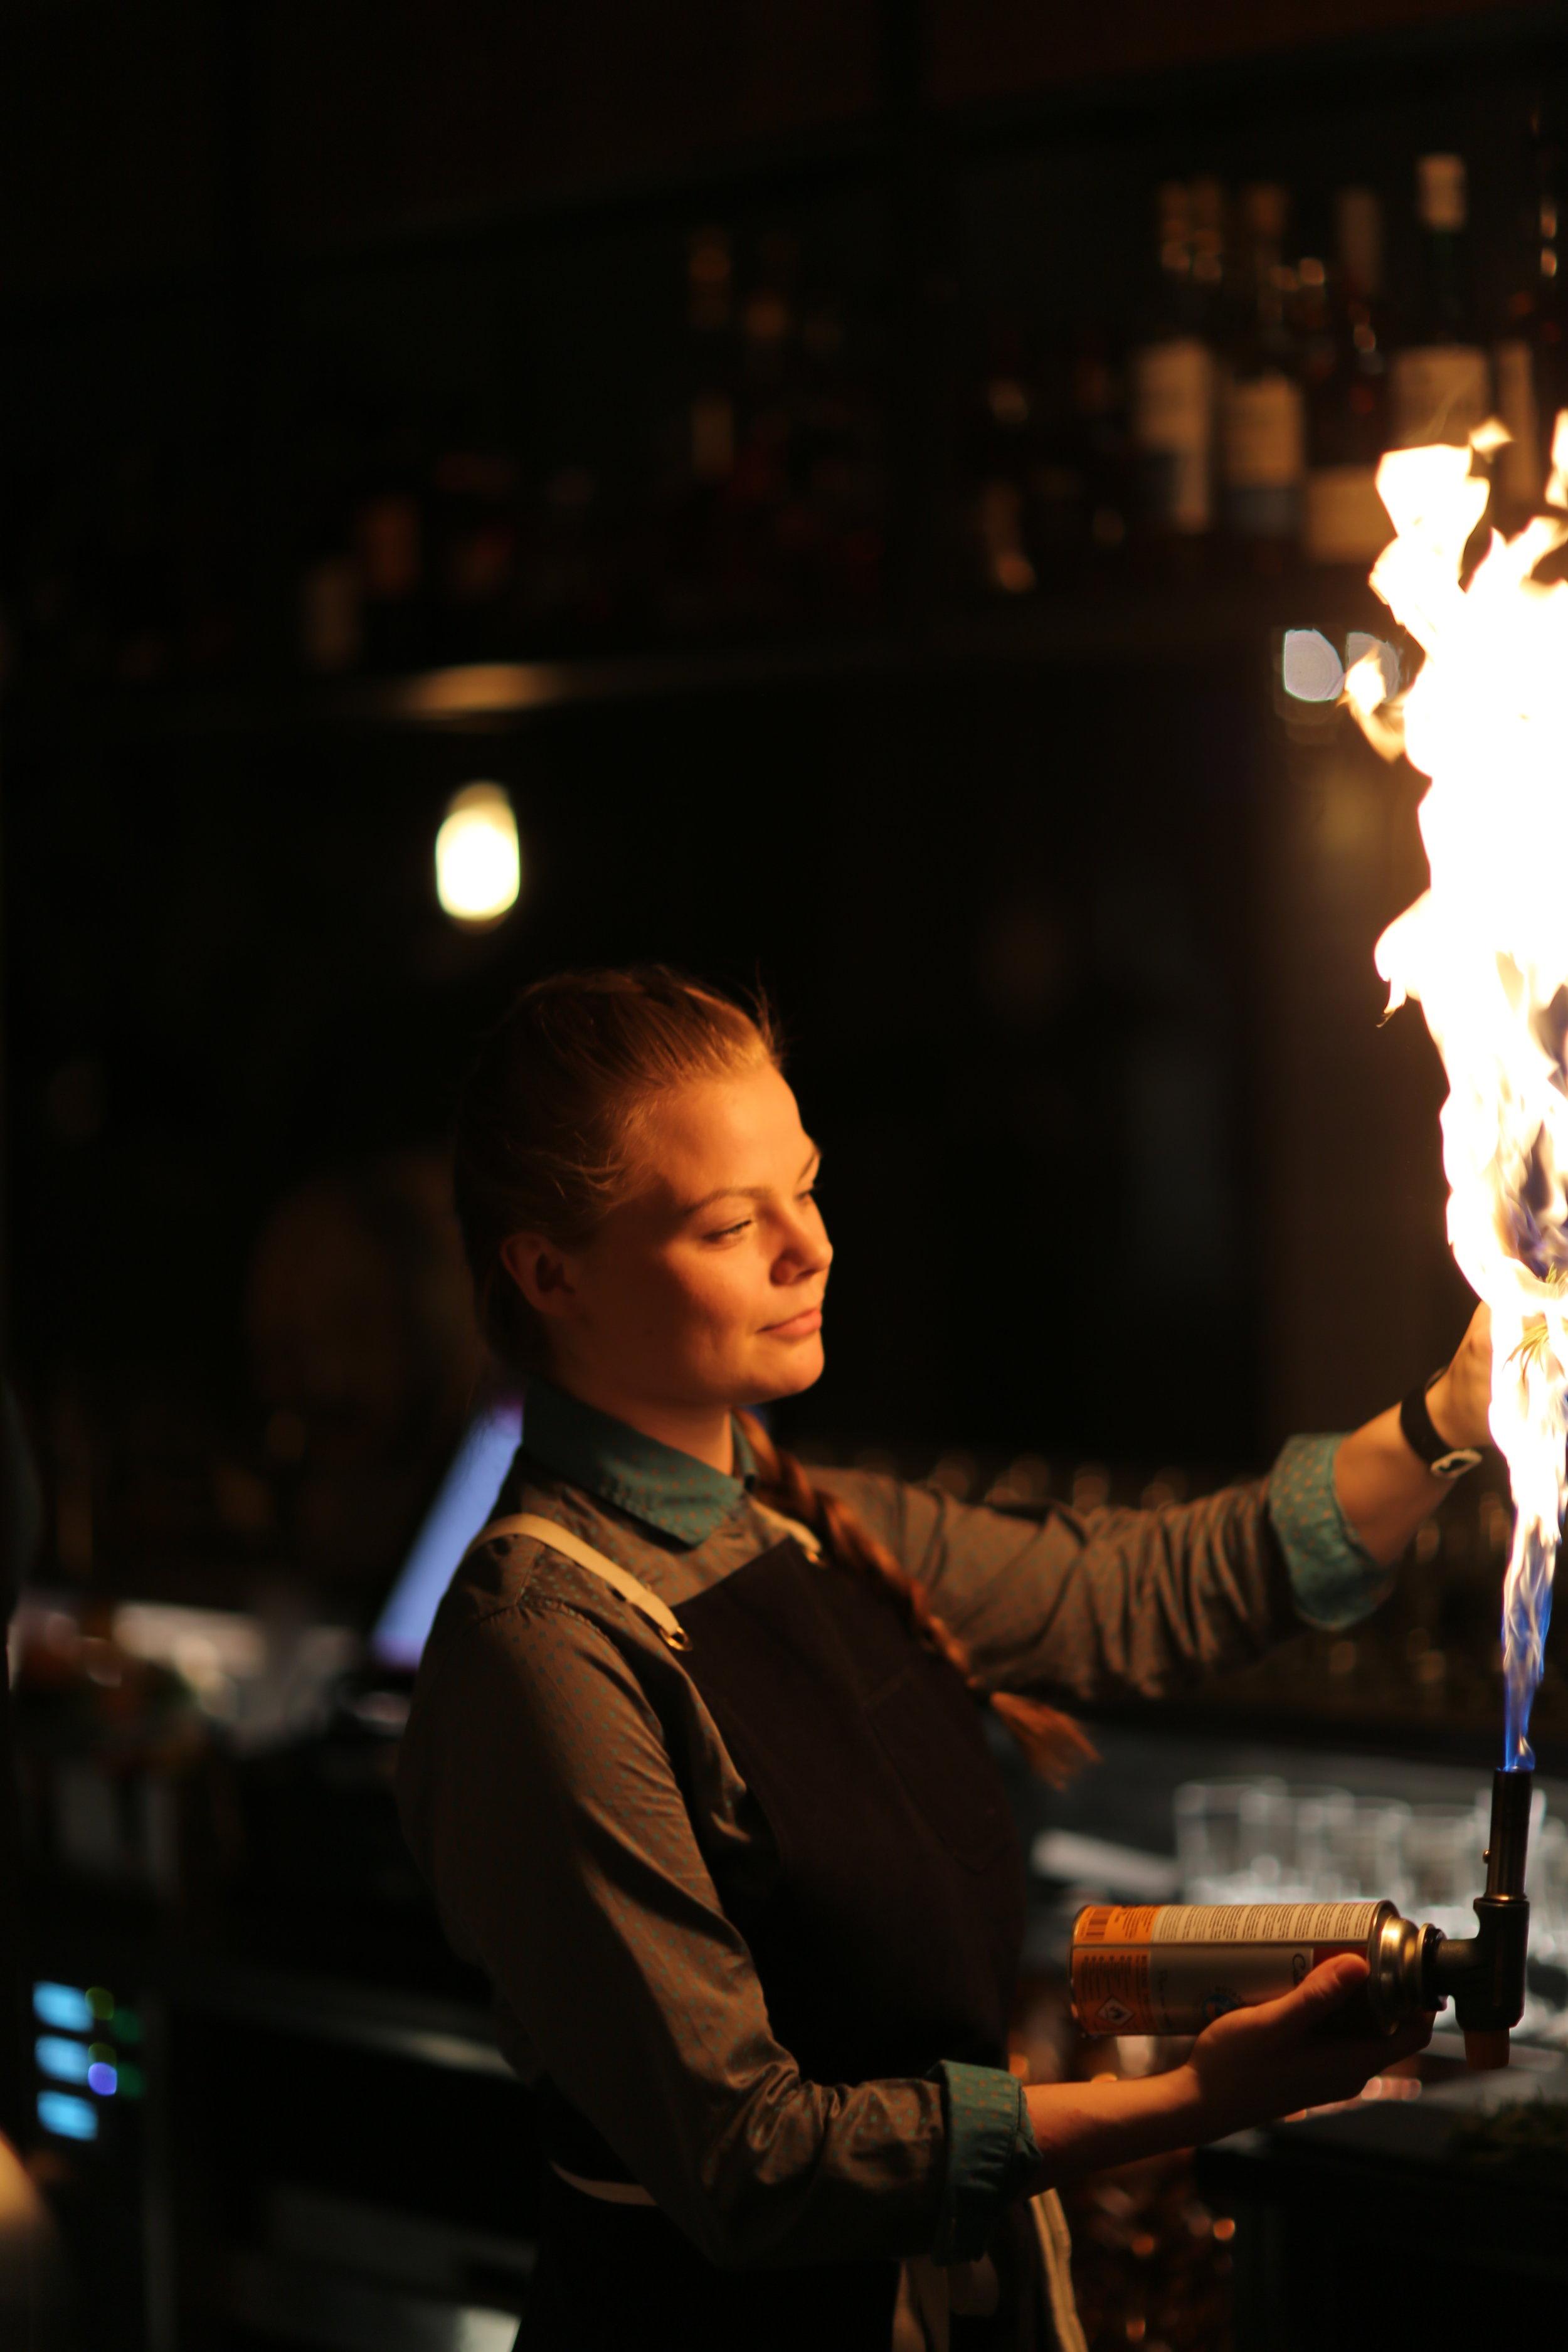 Þelma lights a fire